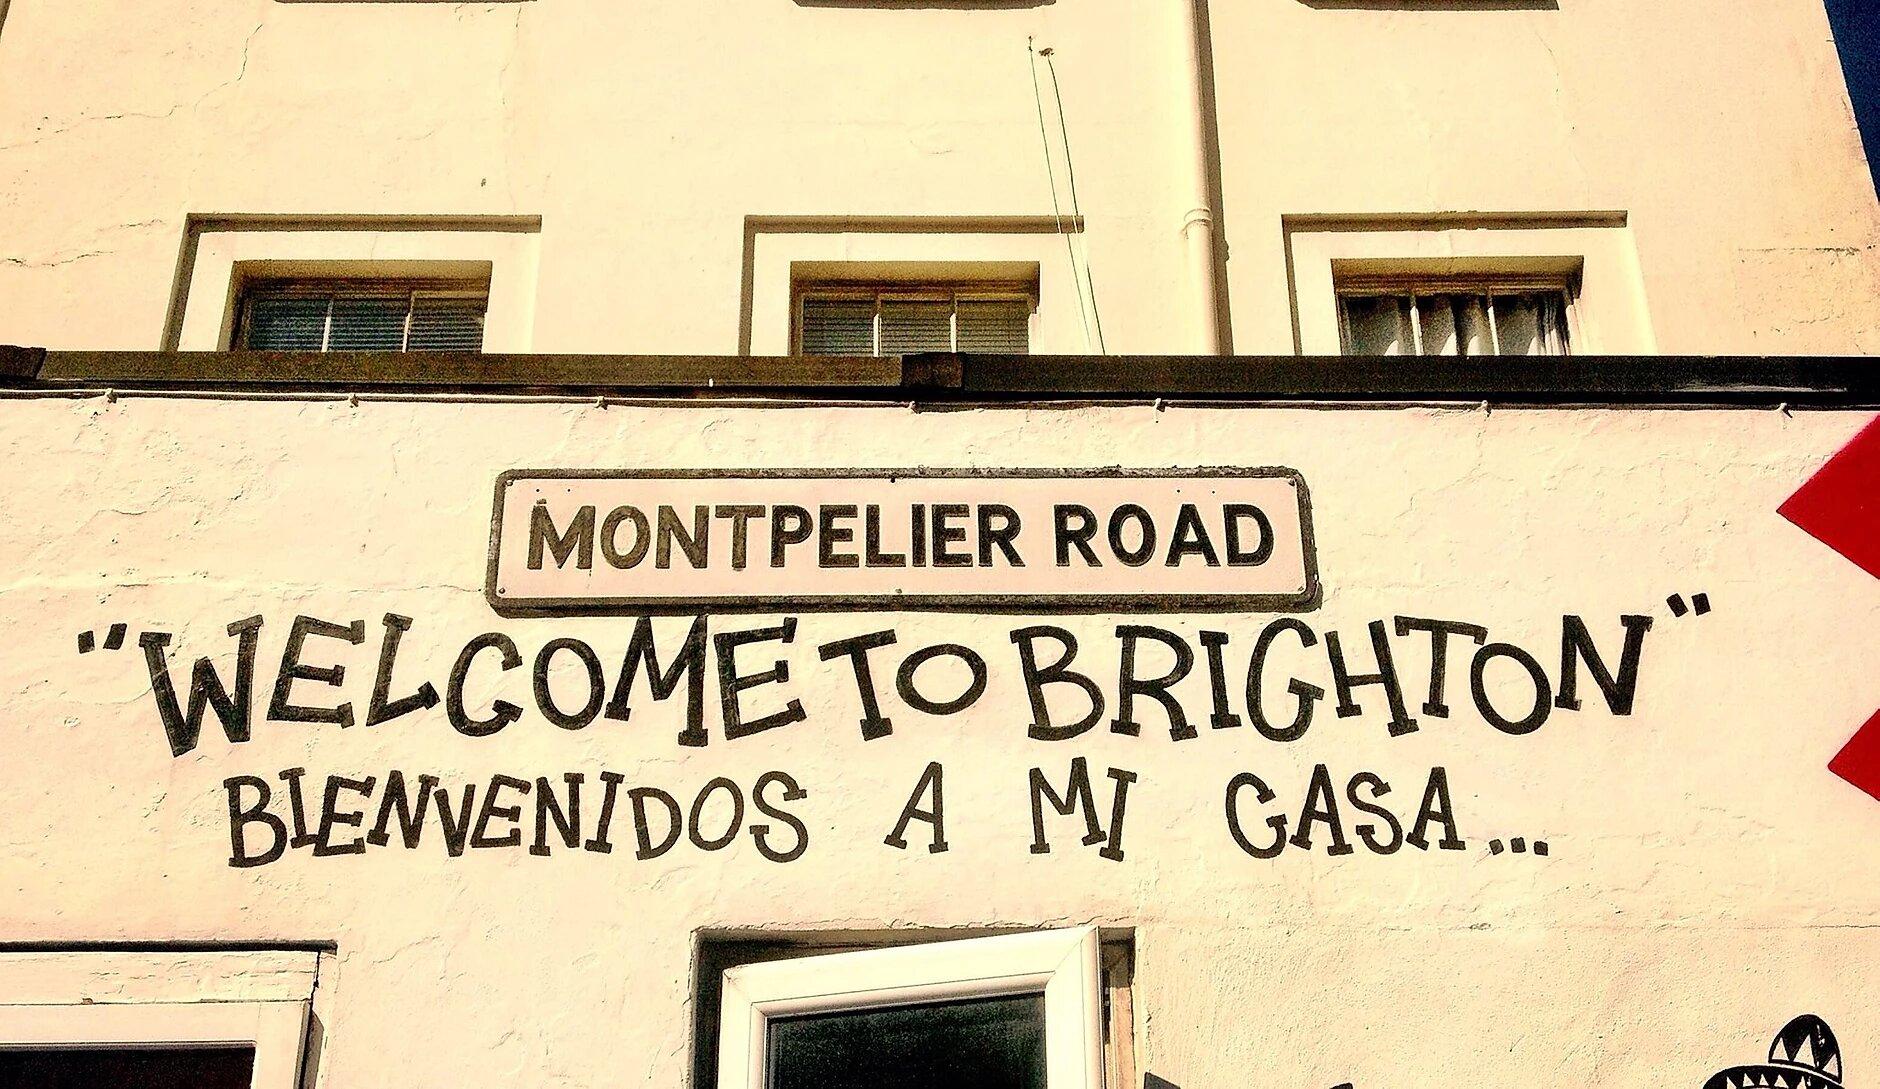 Brighton La Magnifique